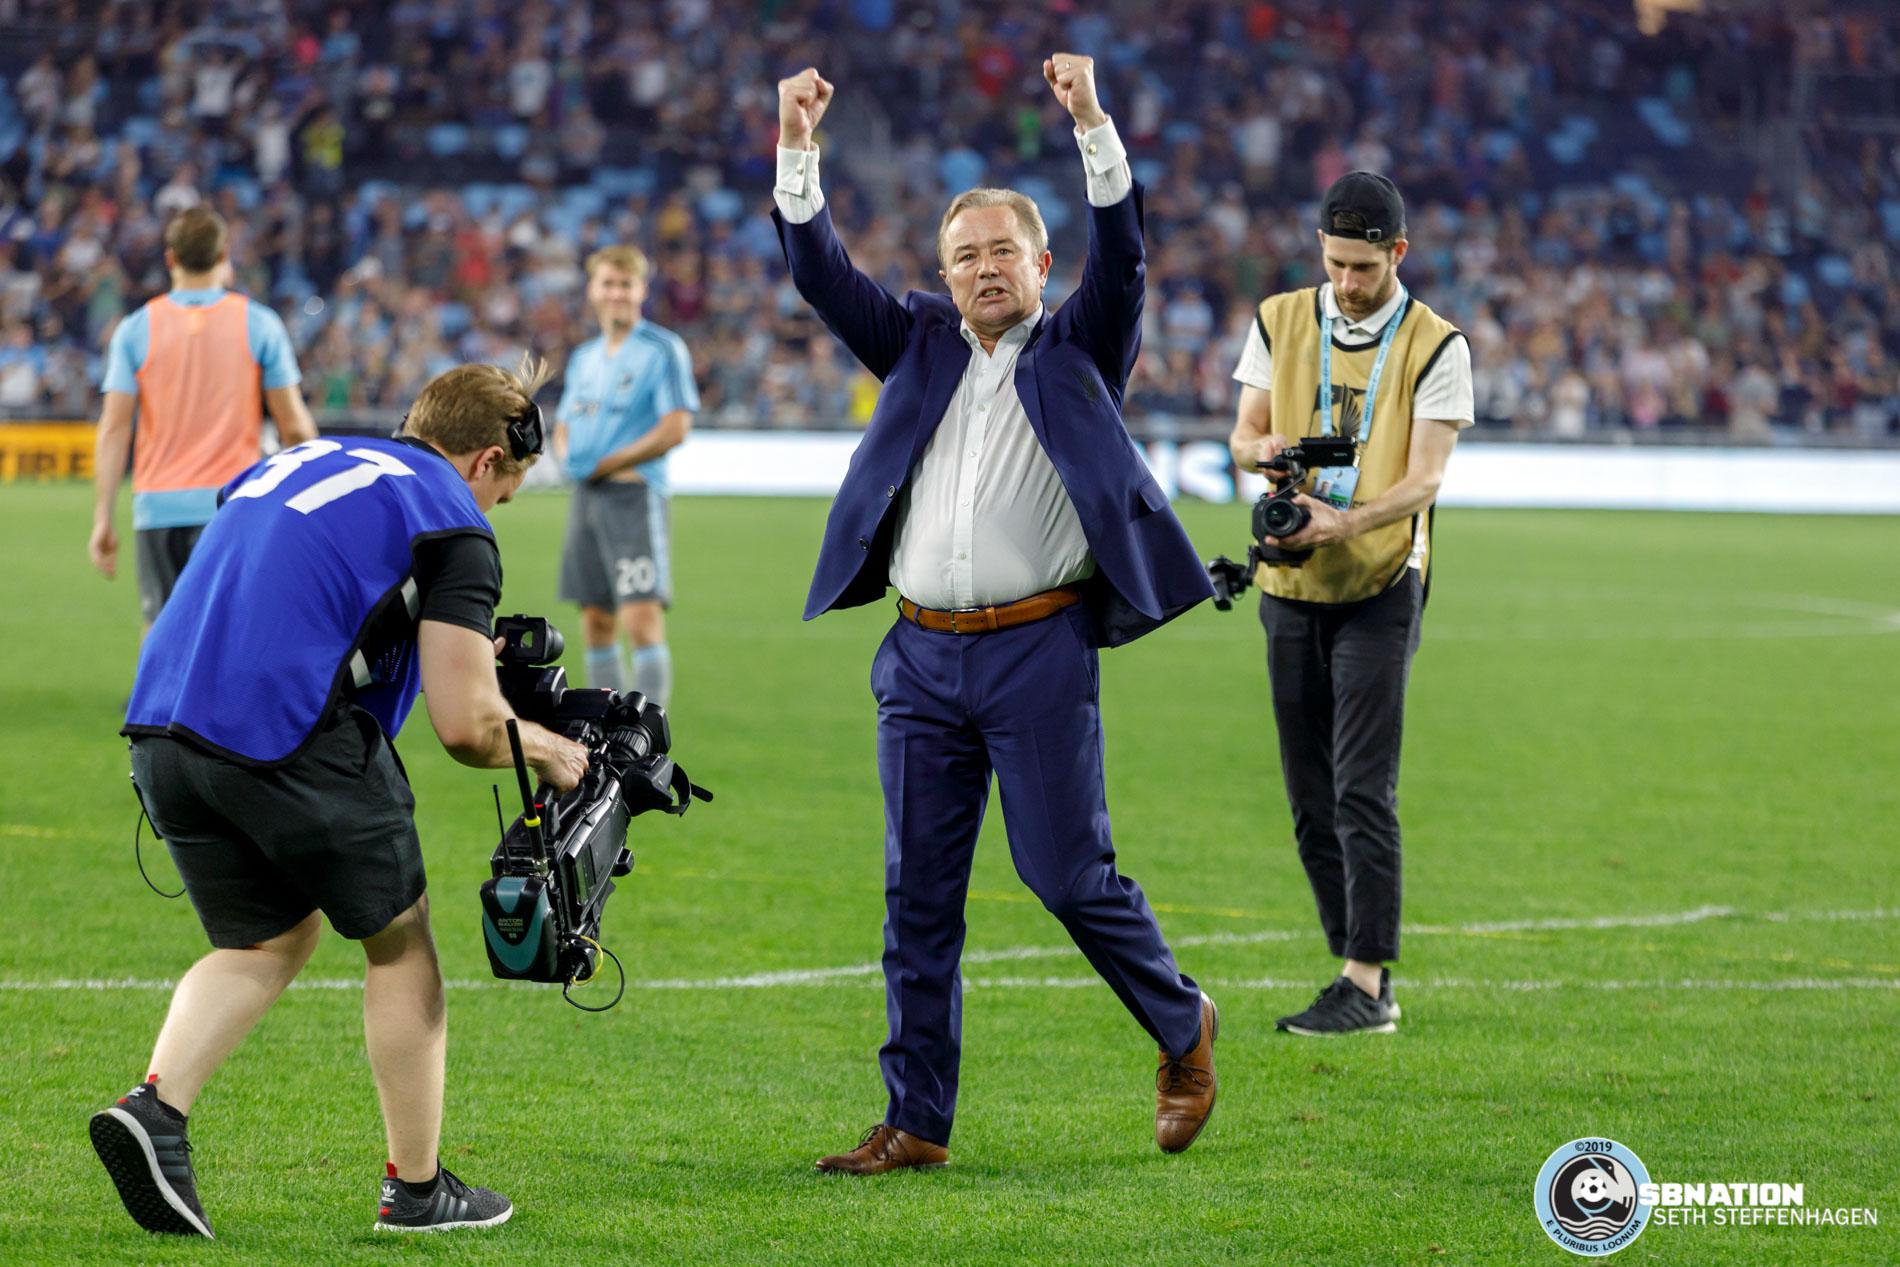 July 13, 2019 - Saint Paul, Minnesota, United States - Minnesota United head coach Adrian Heath walks over to the Wonderwall to celebrate the 1-0 victory over FC Dallas at Allianz Field.